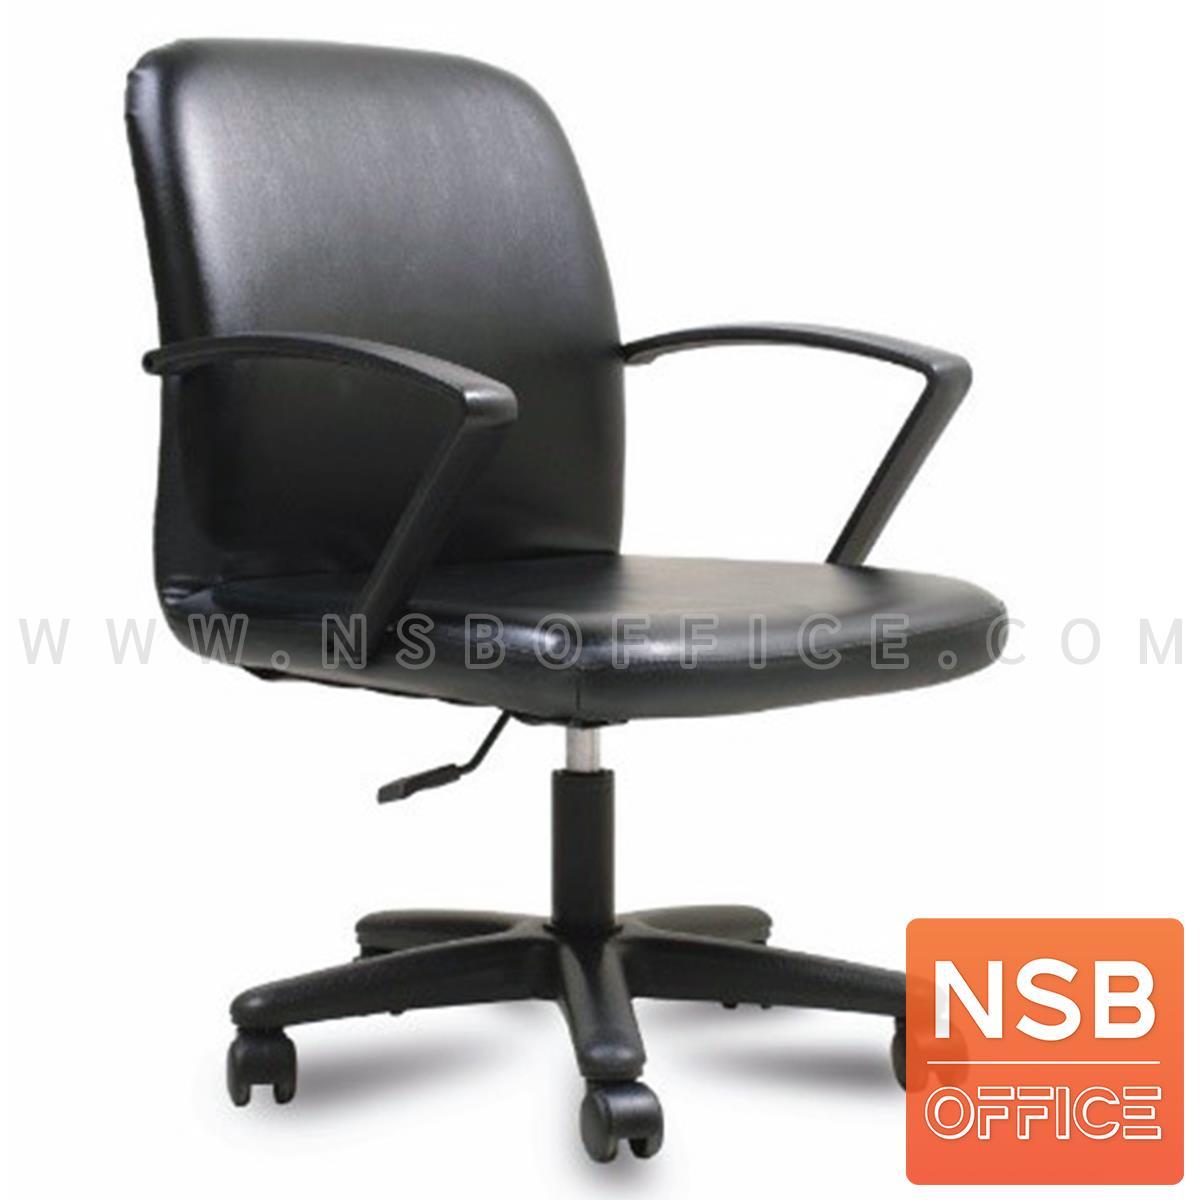 B03A453:เก้าอี้สำนักงาน  รุ่น PE-0061L  โช๊คแก๊ส